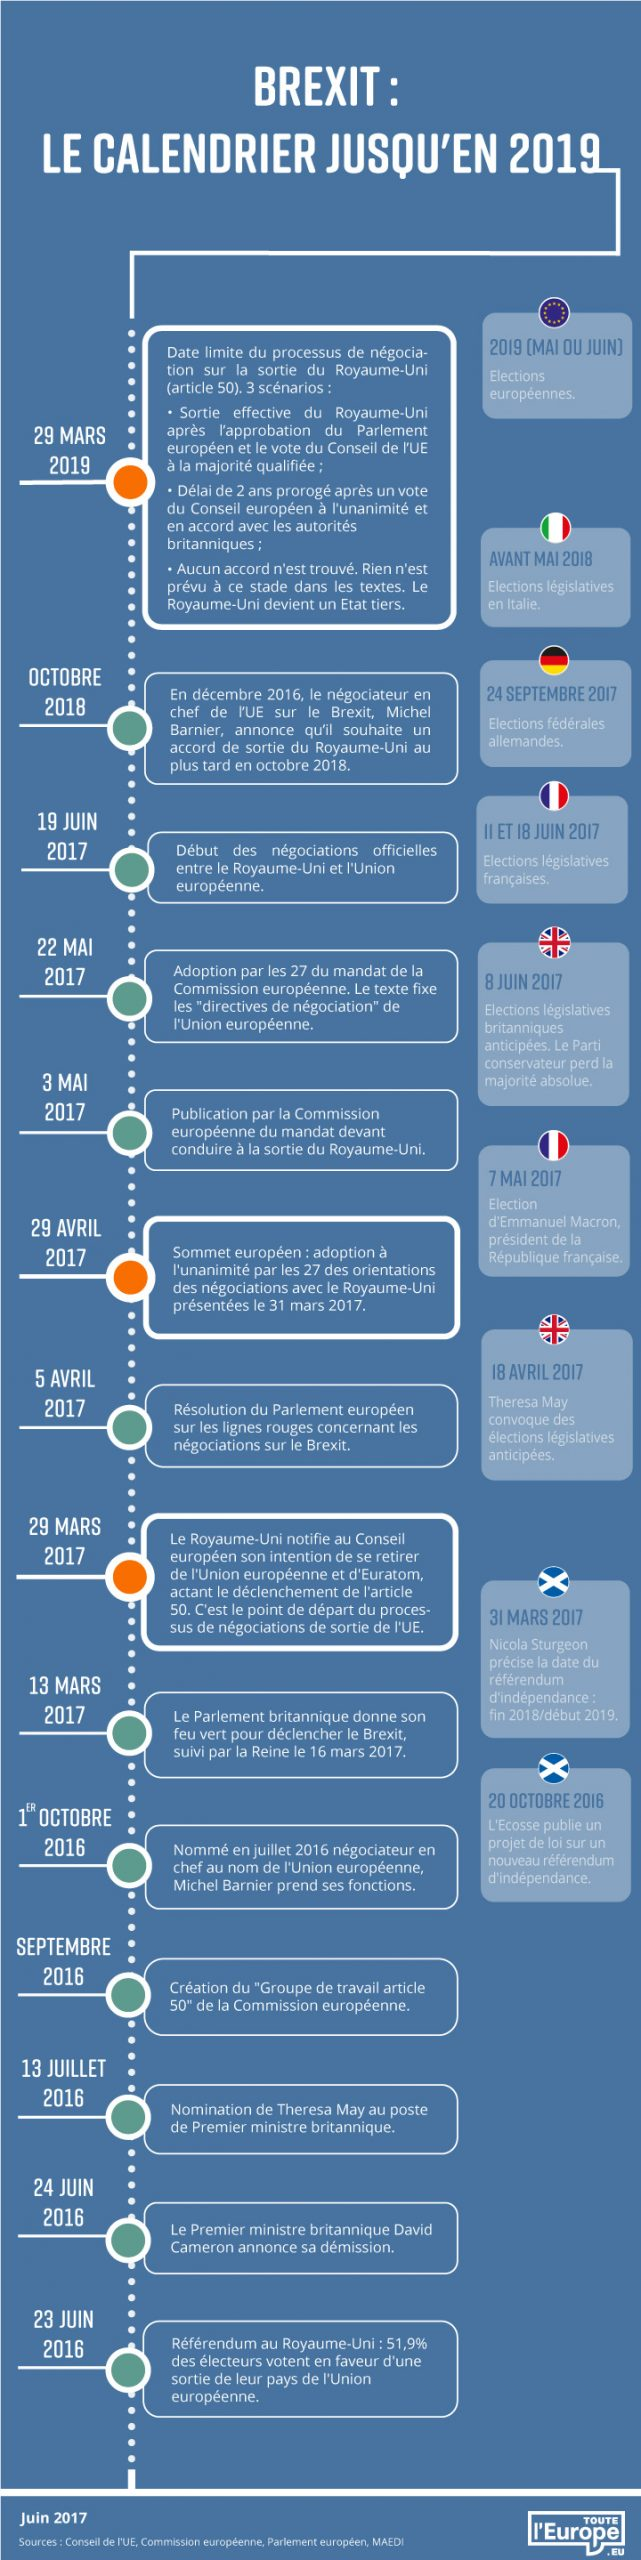 Datavisualisation : calendrier du Brexit jusqu'en 2019